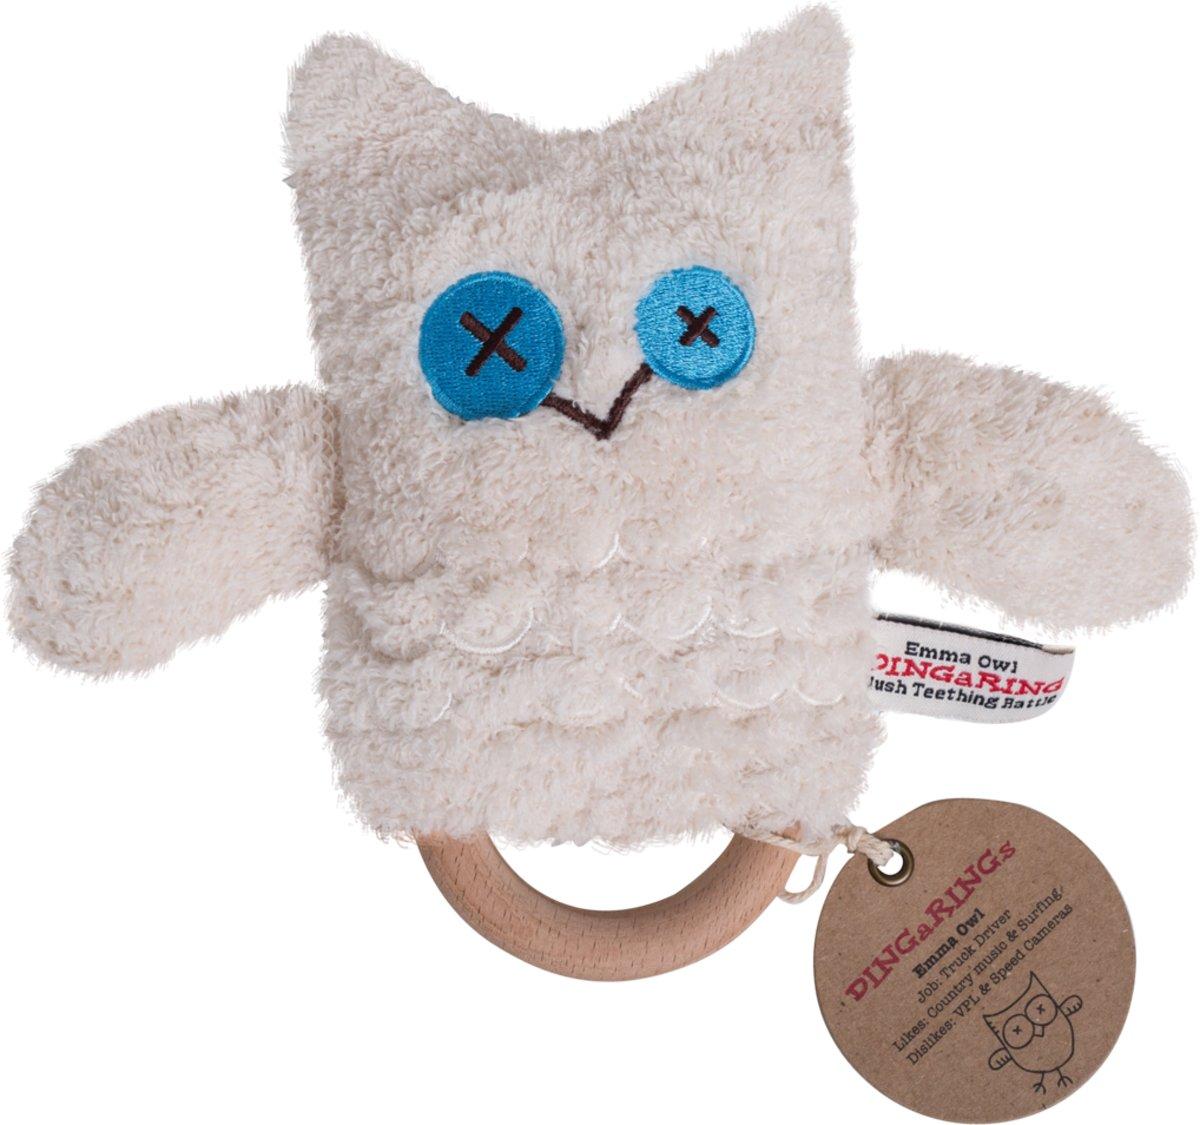 Emma Owl Dingaring OB Designs